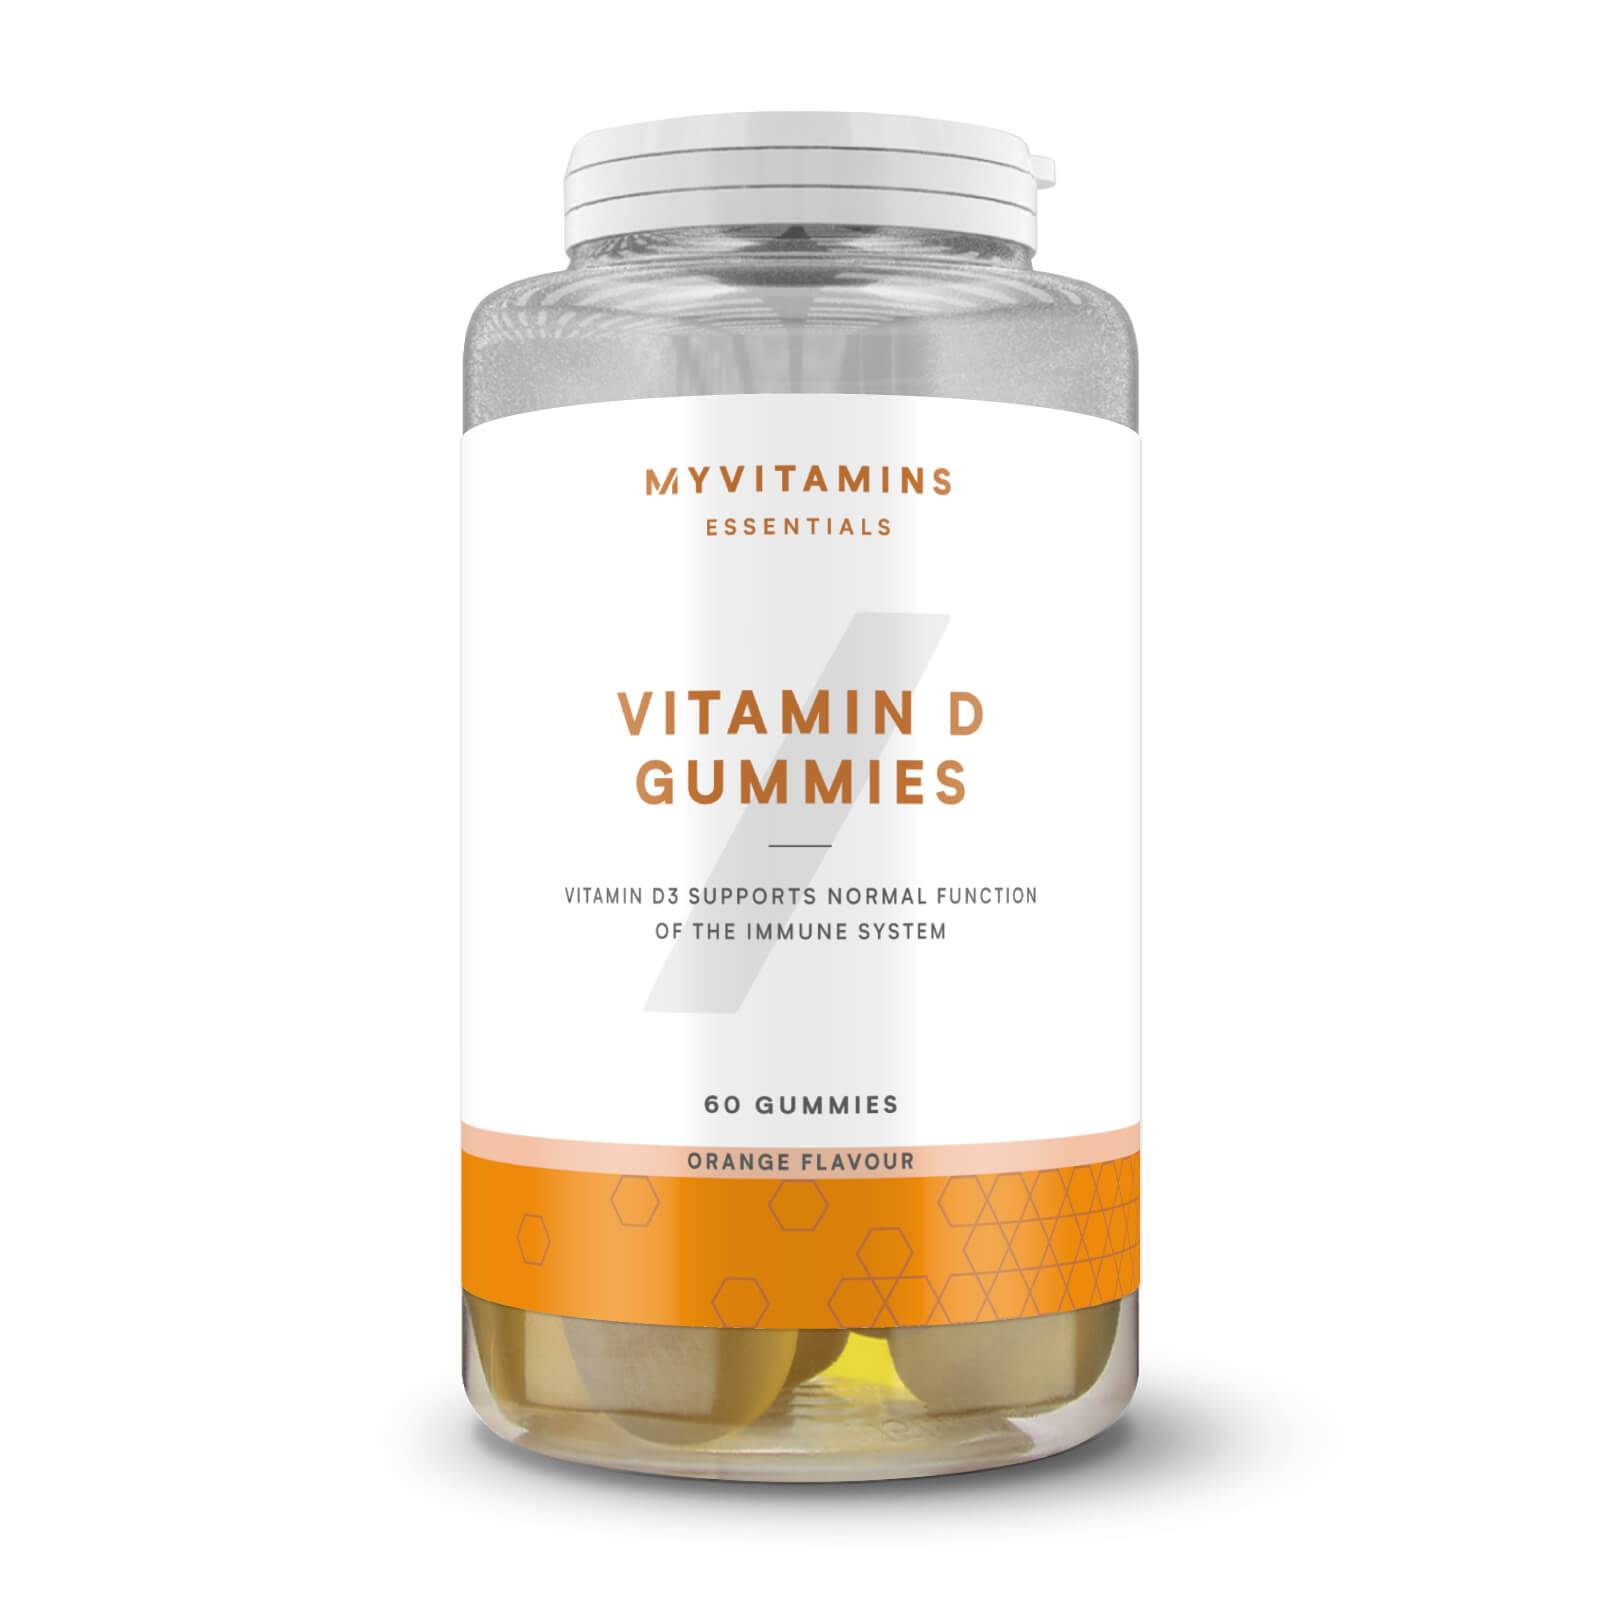 Myvitamins Bonbons à la vitamineD - 60servings - Orange